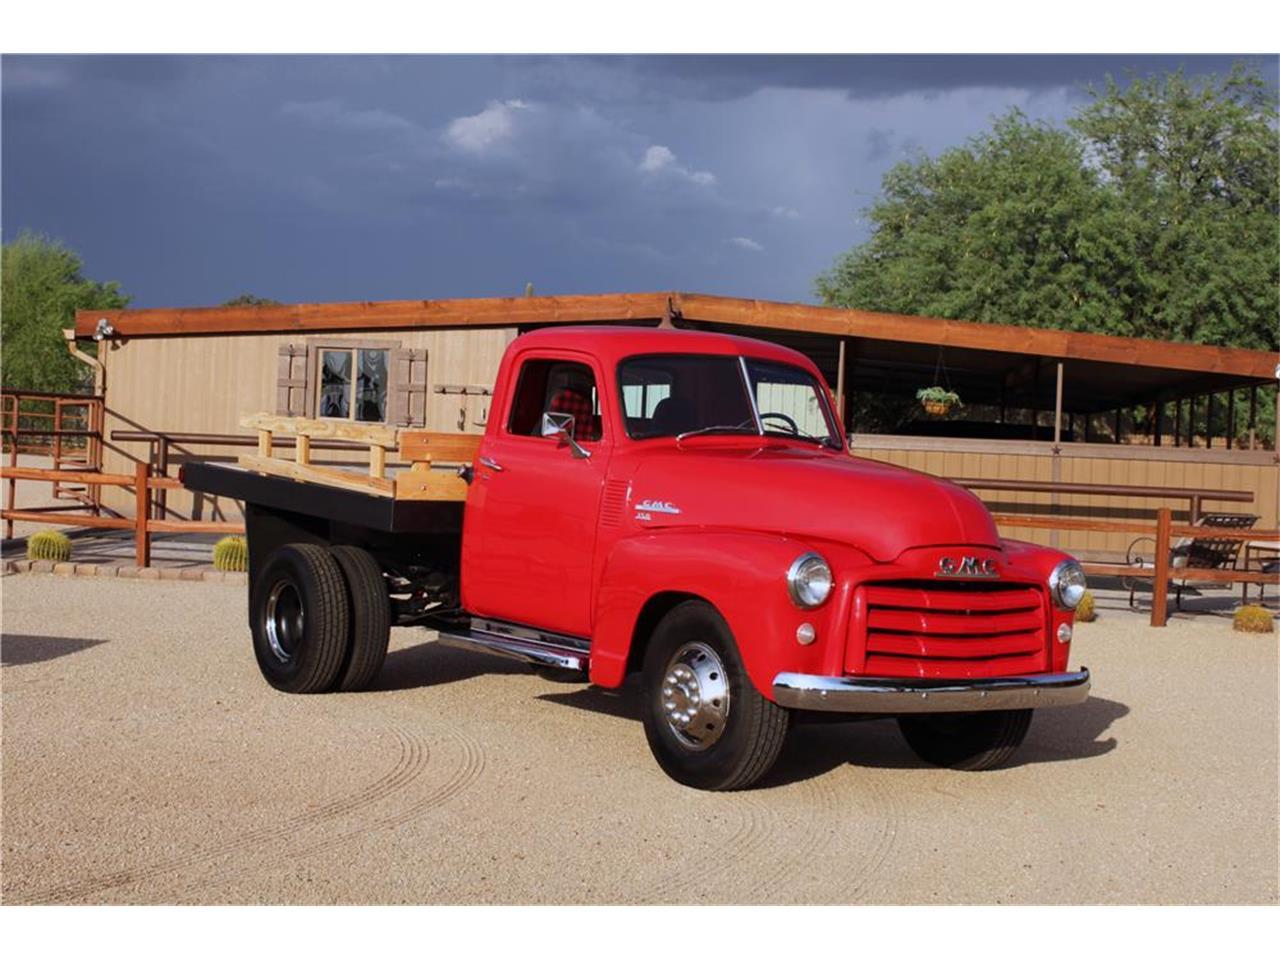 1950 Gmc 1 Ton Flatbed For Sale Classiccars Com Cc 1136607